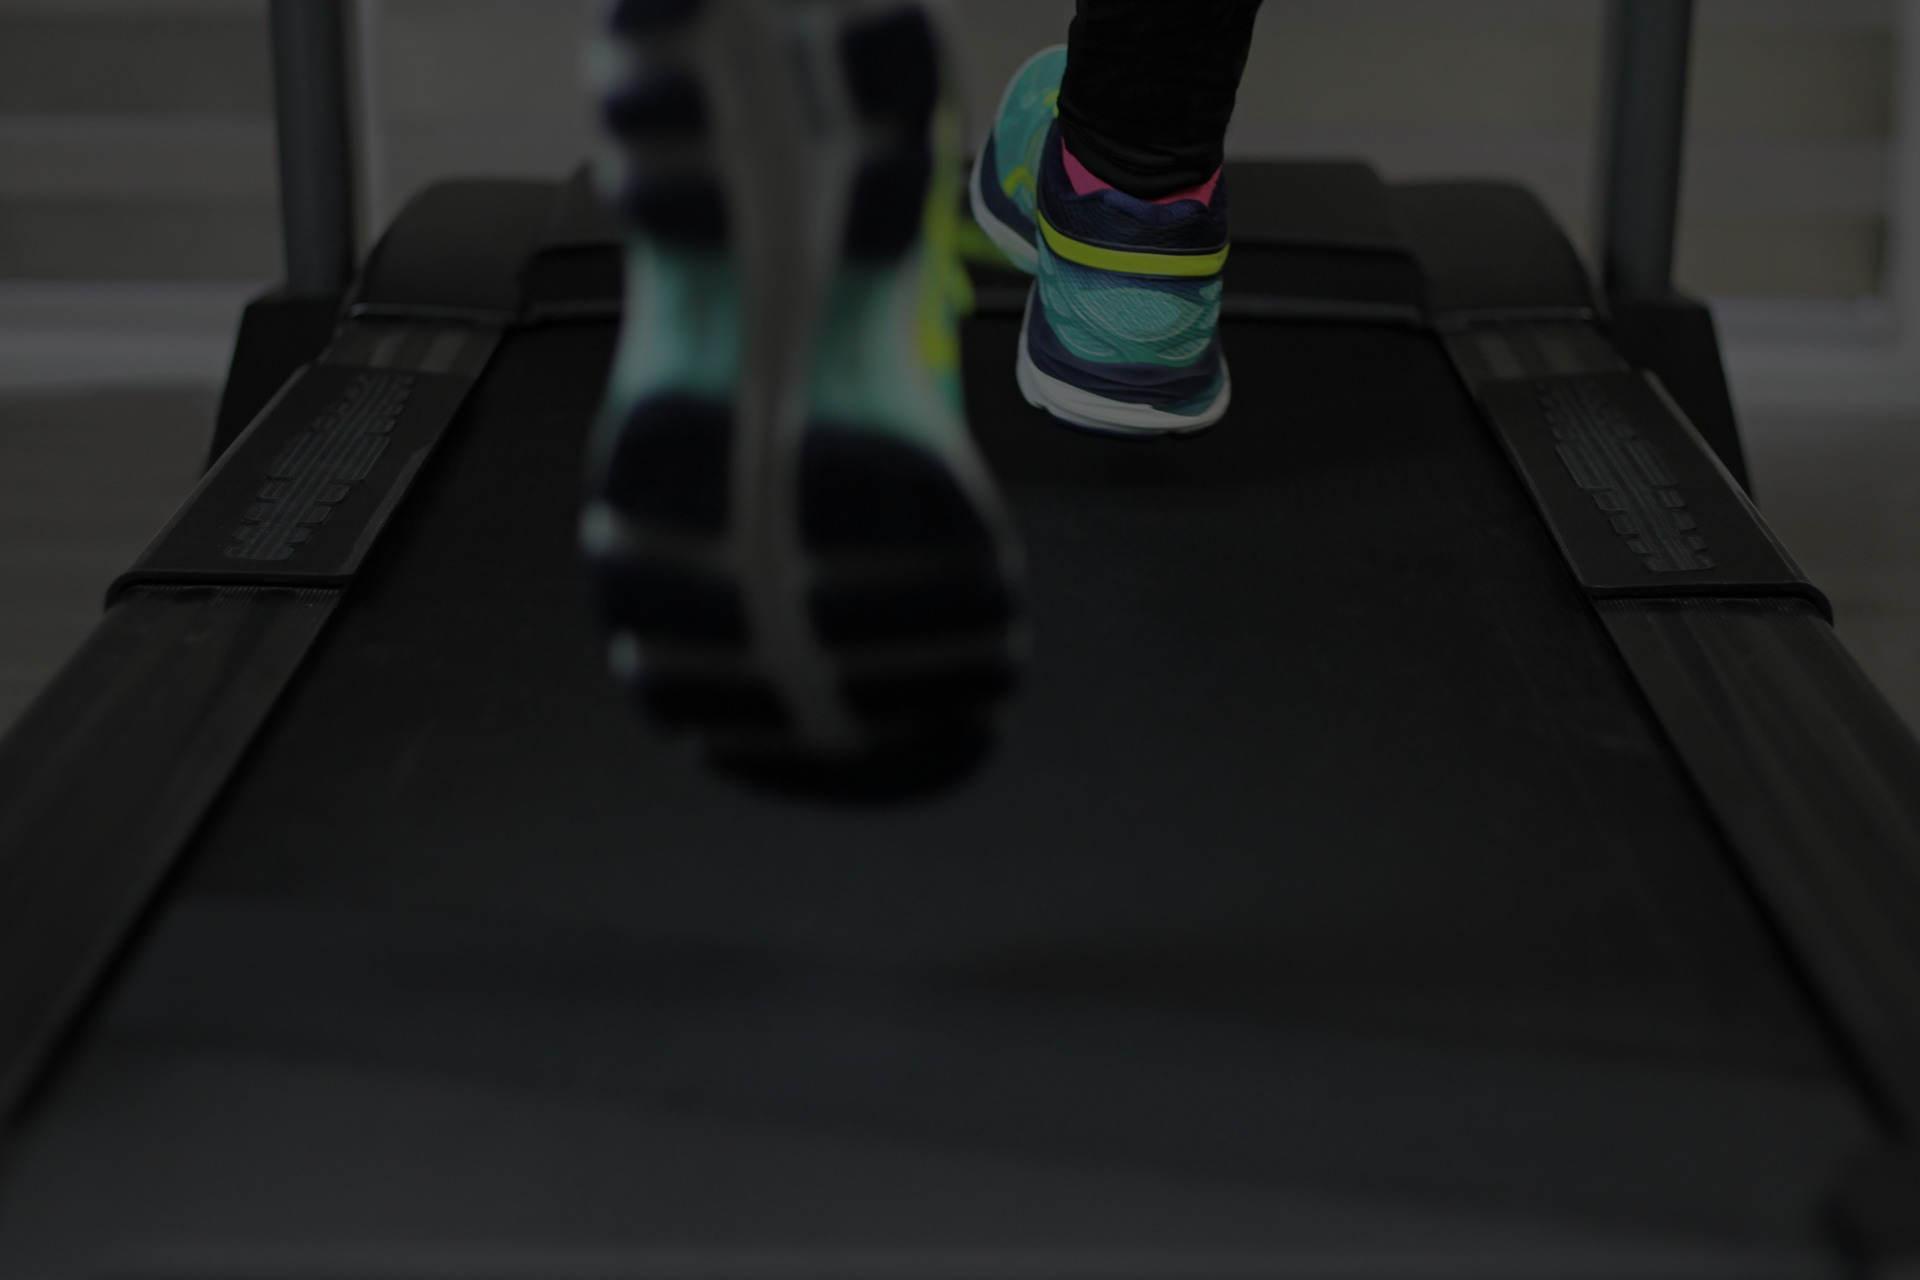 My Treadmill Reviews UK